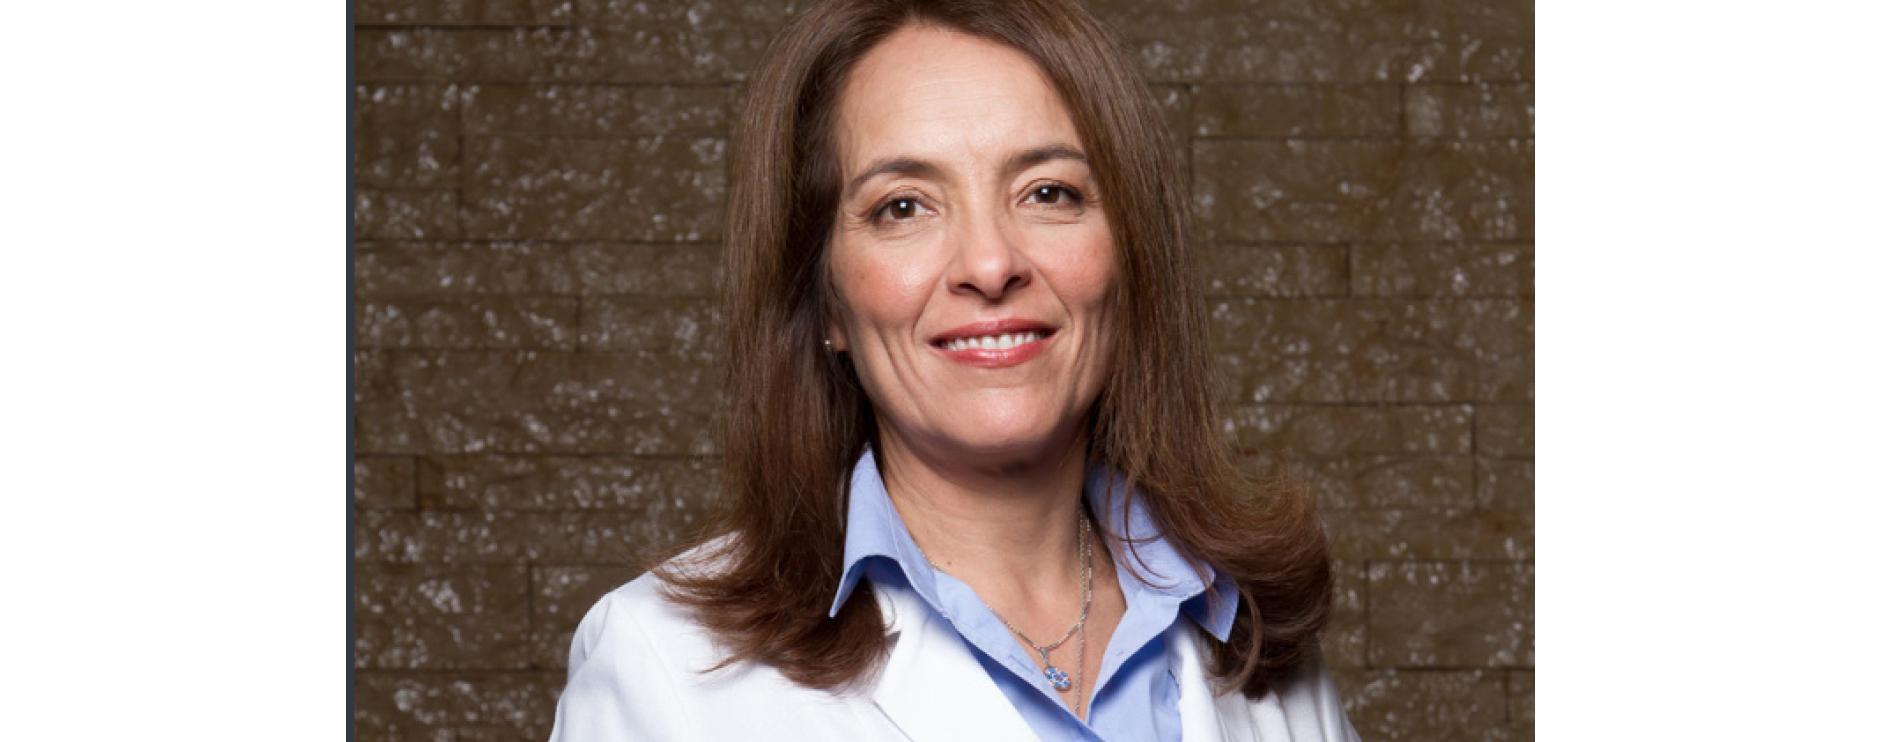 Verónica Pinto-Bruesten